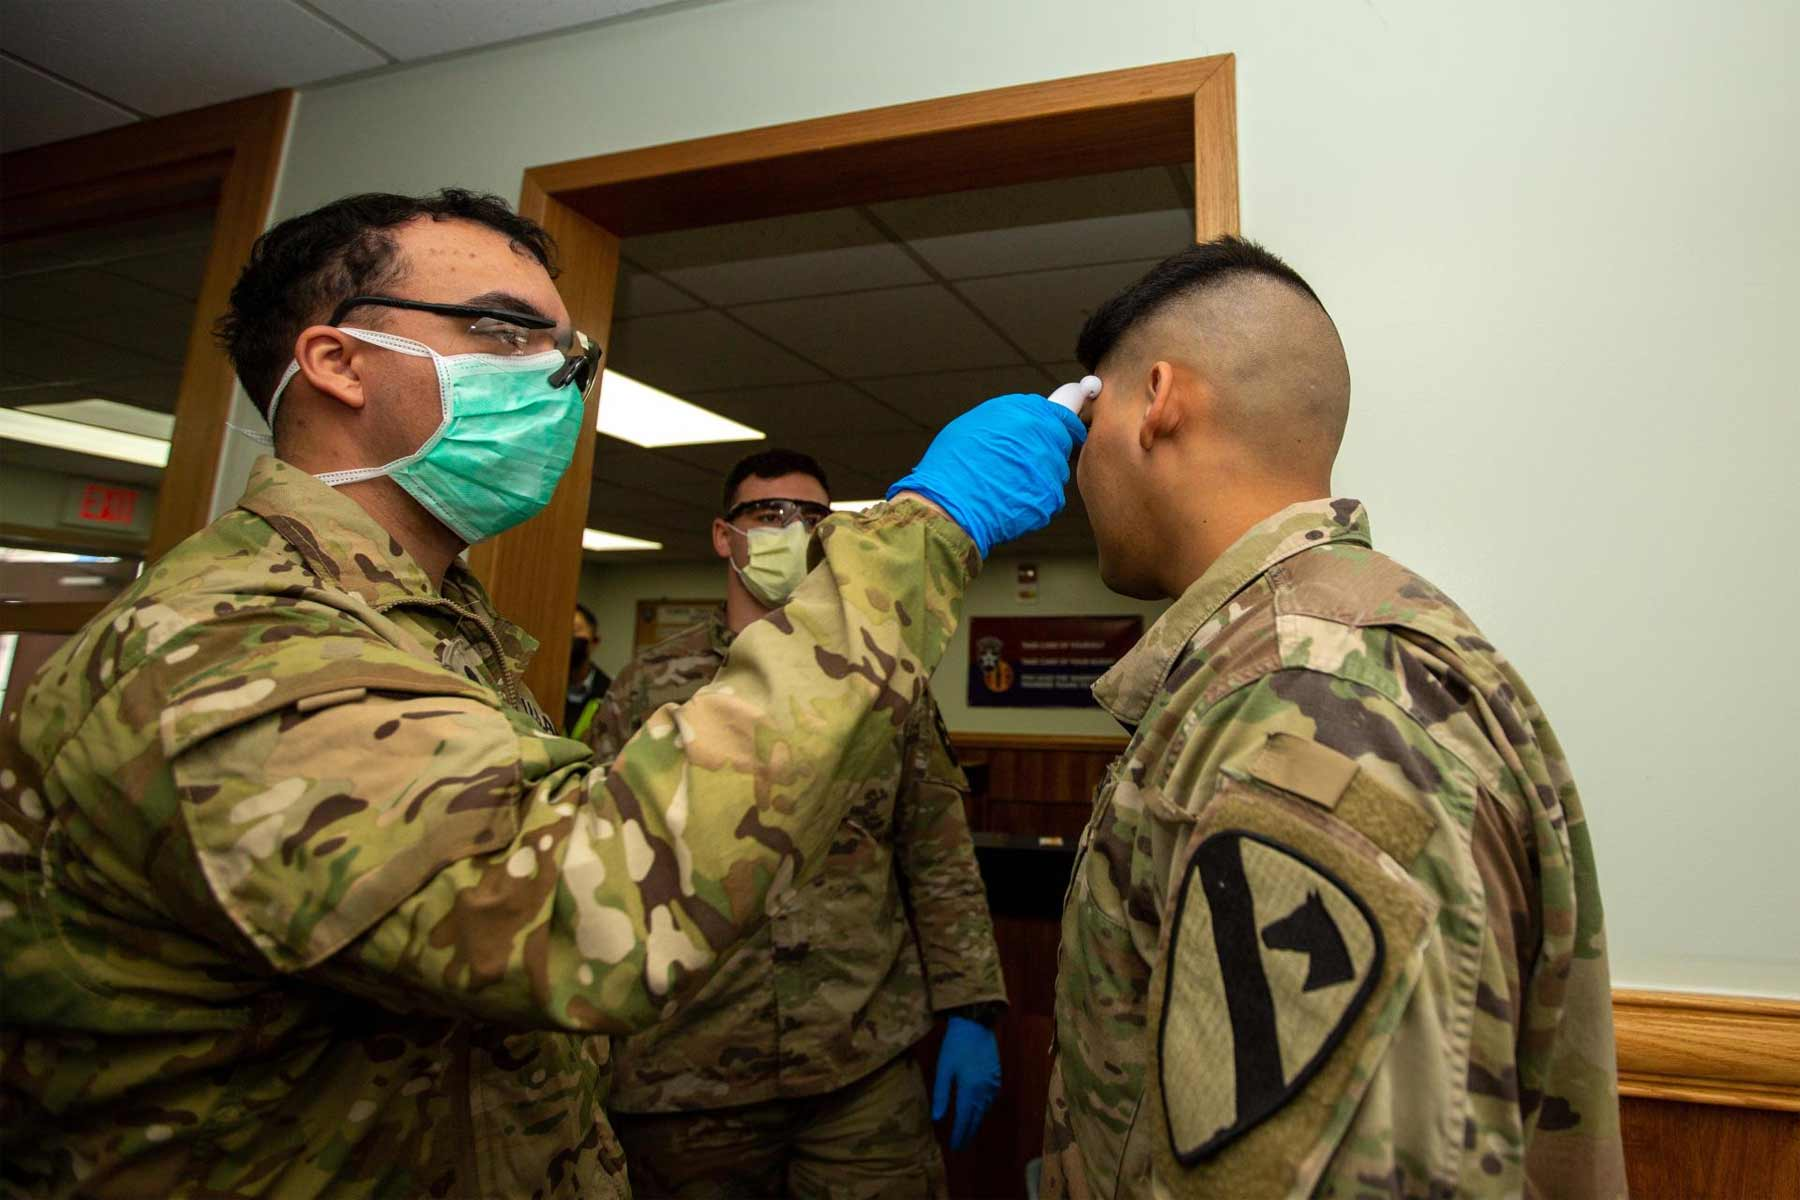 US Military Cracks Down on Travel, Cancels Meetings as Coronavirus Cases  Spread   Military.com